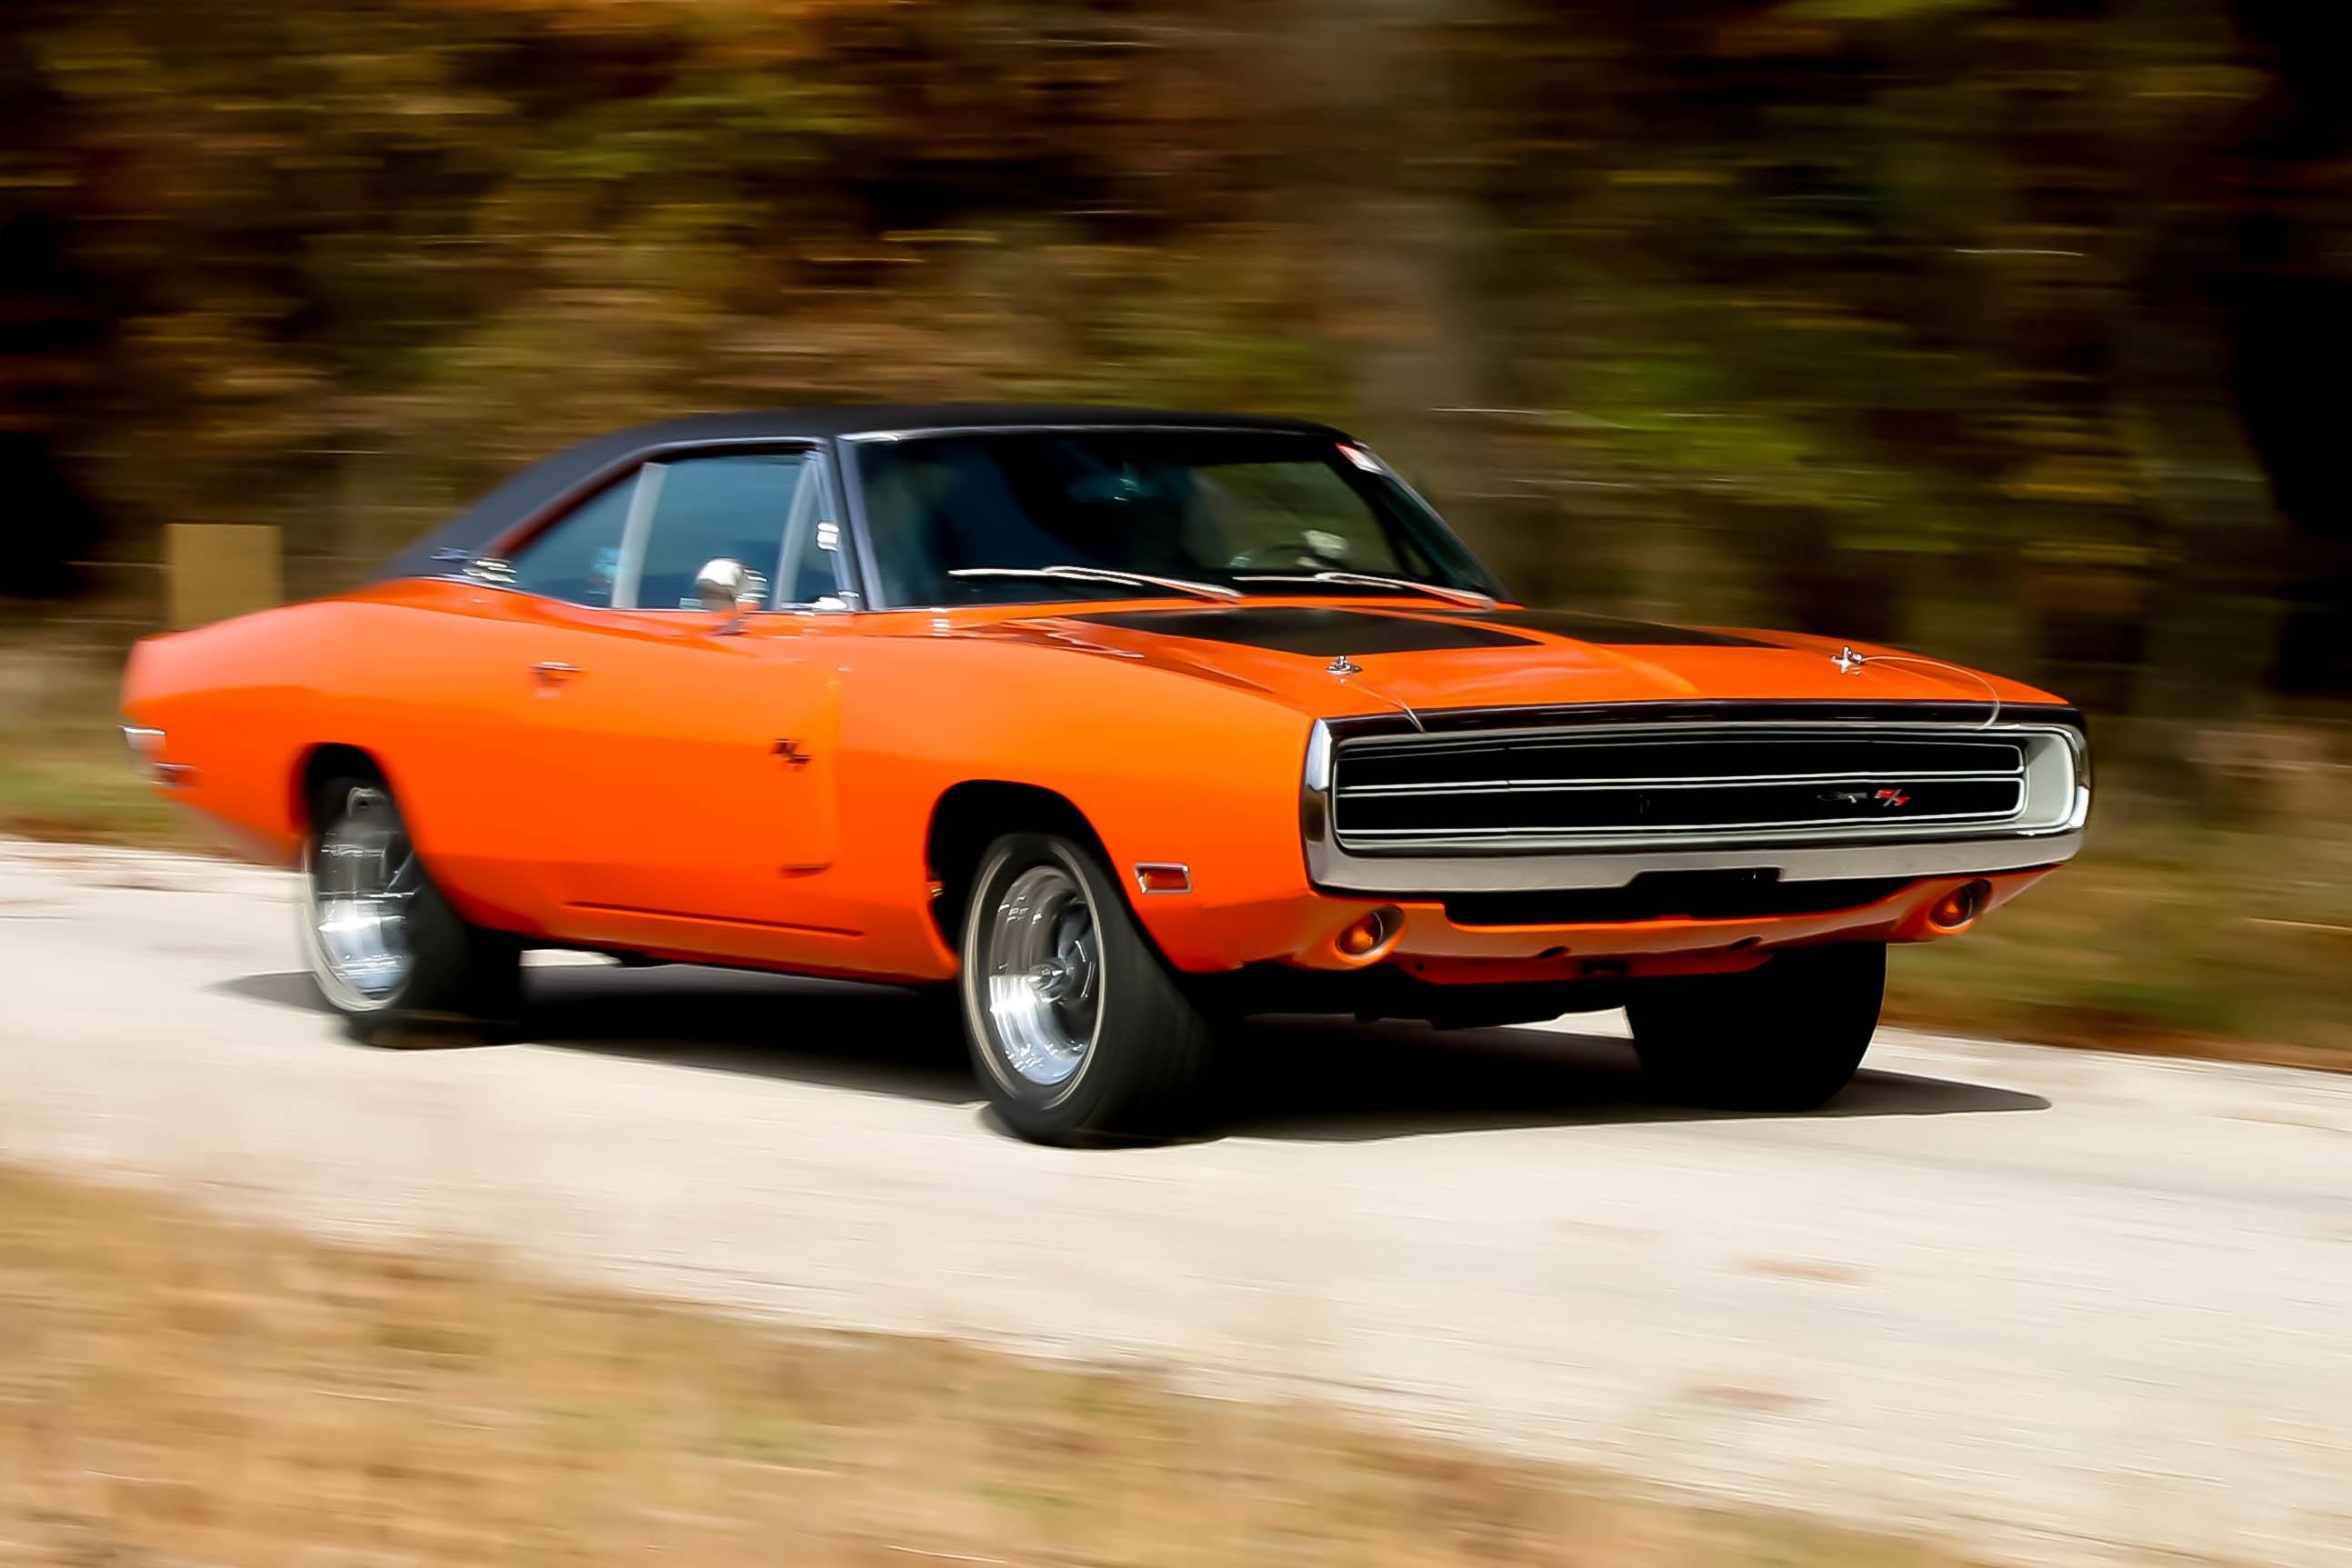 Free Images Road Motion Orange Muscle Car Dodge Charger Land